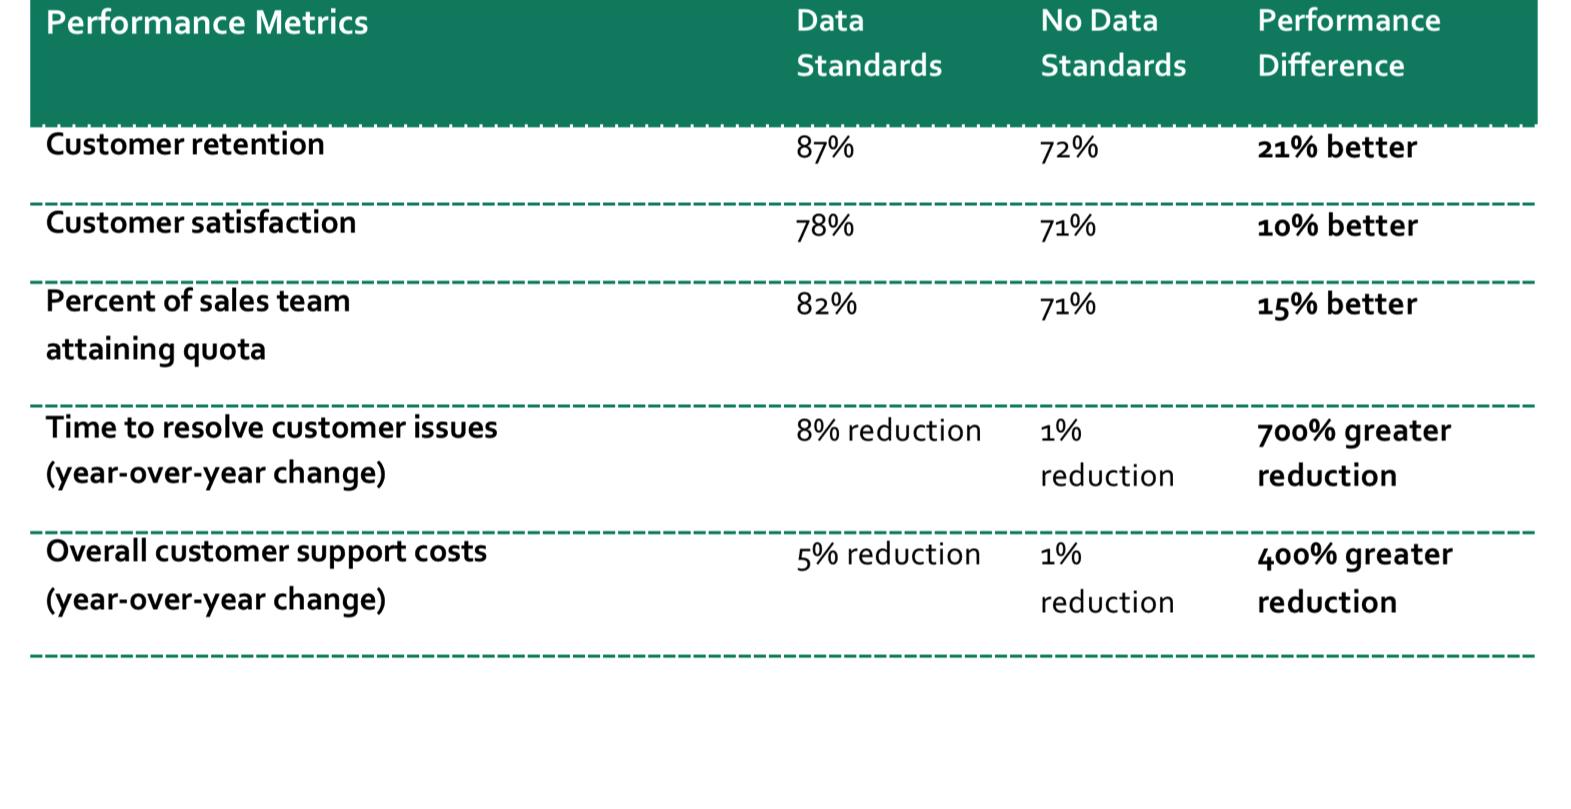 Quality Data Correlates to Happier Customers